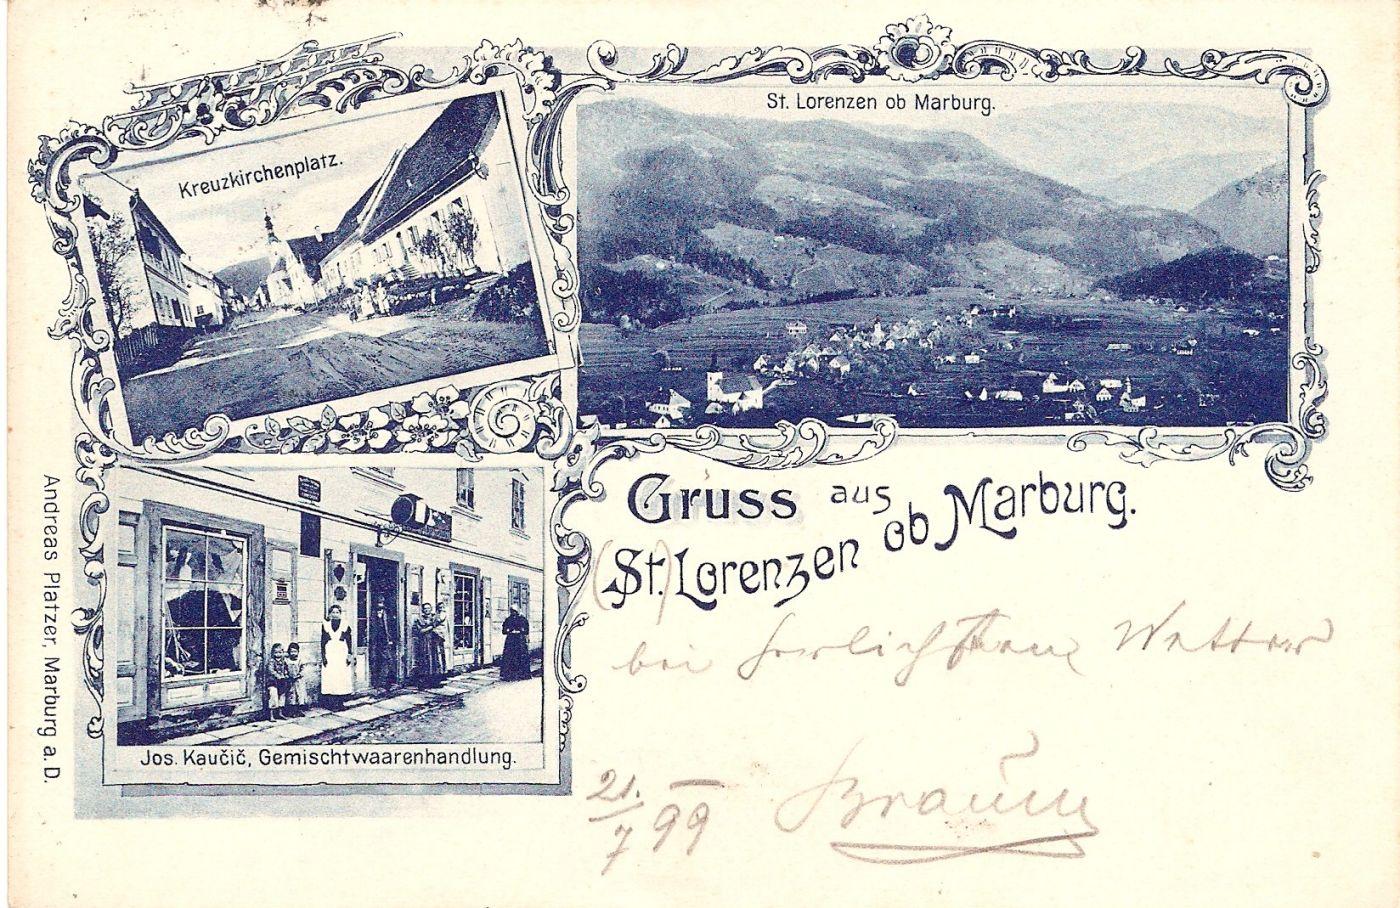 http://shramba.lovrenc.net/zomaster/klepet/trgovina-jos-kaucic-1899.jpg